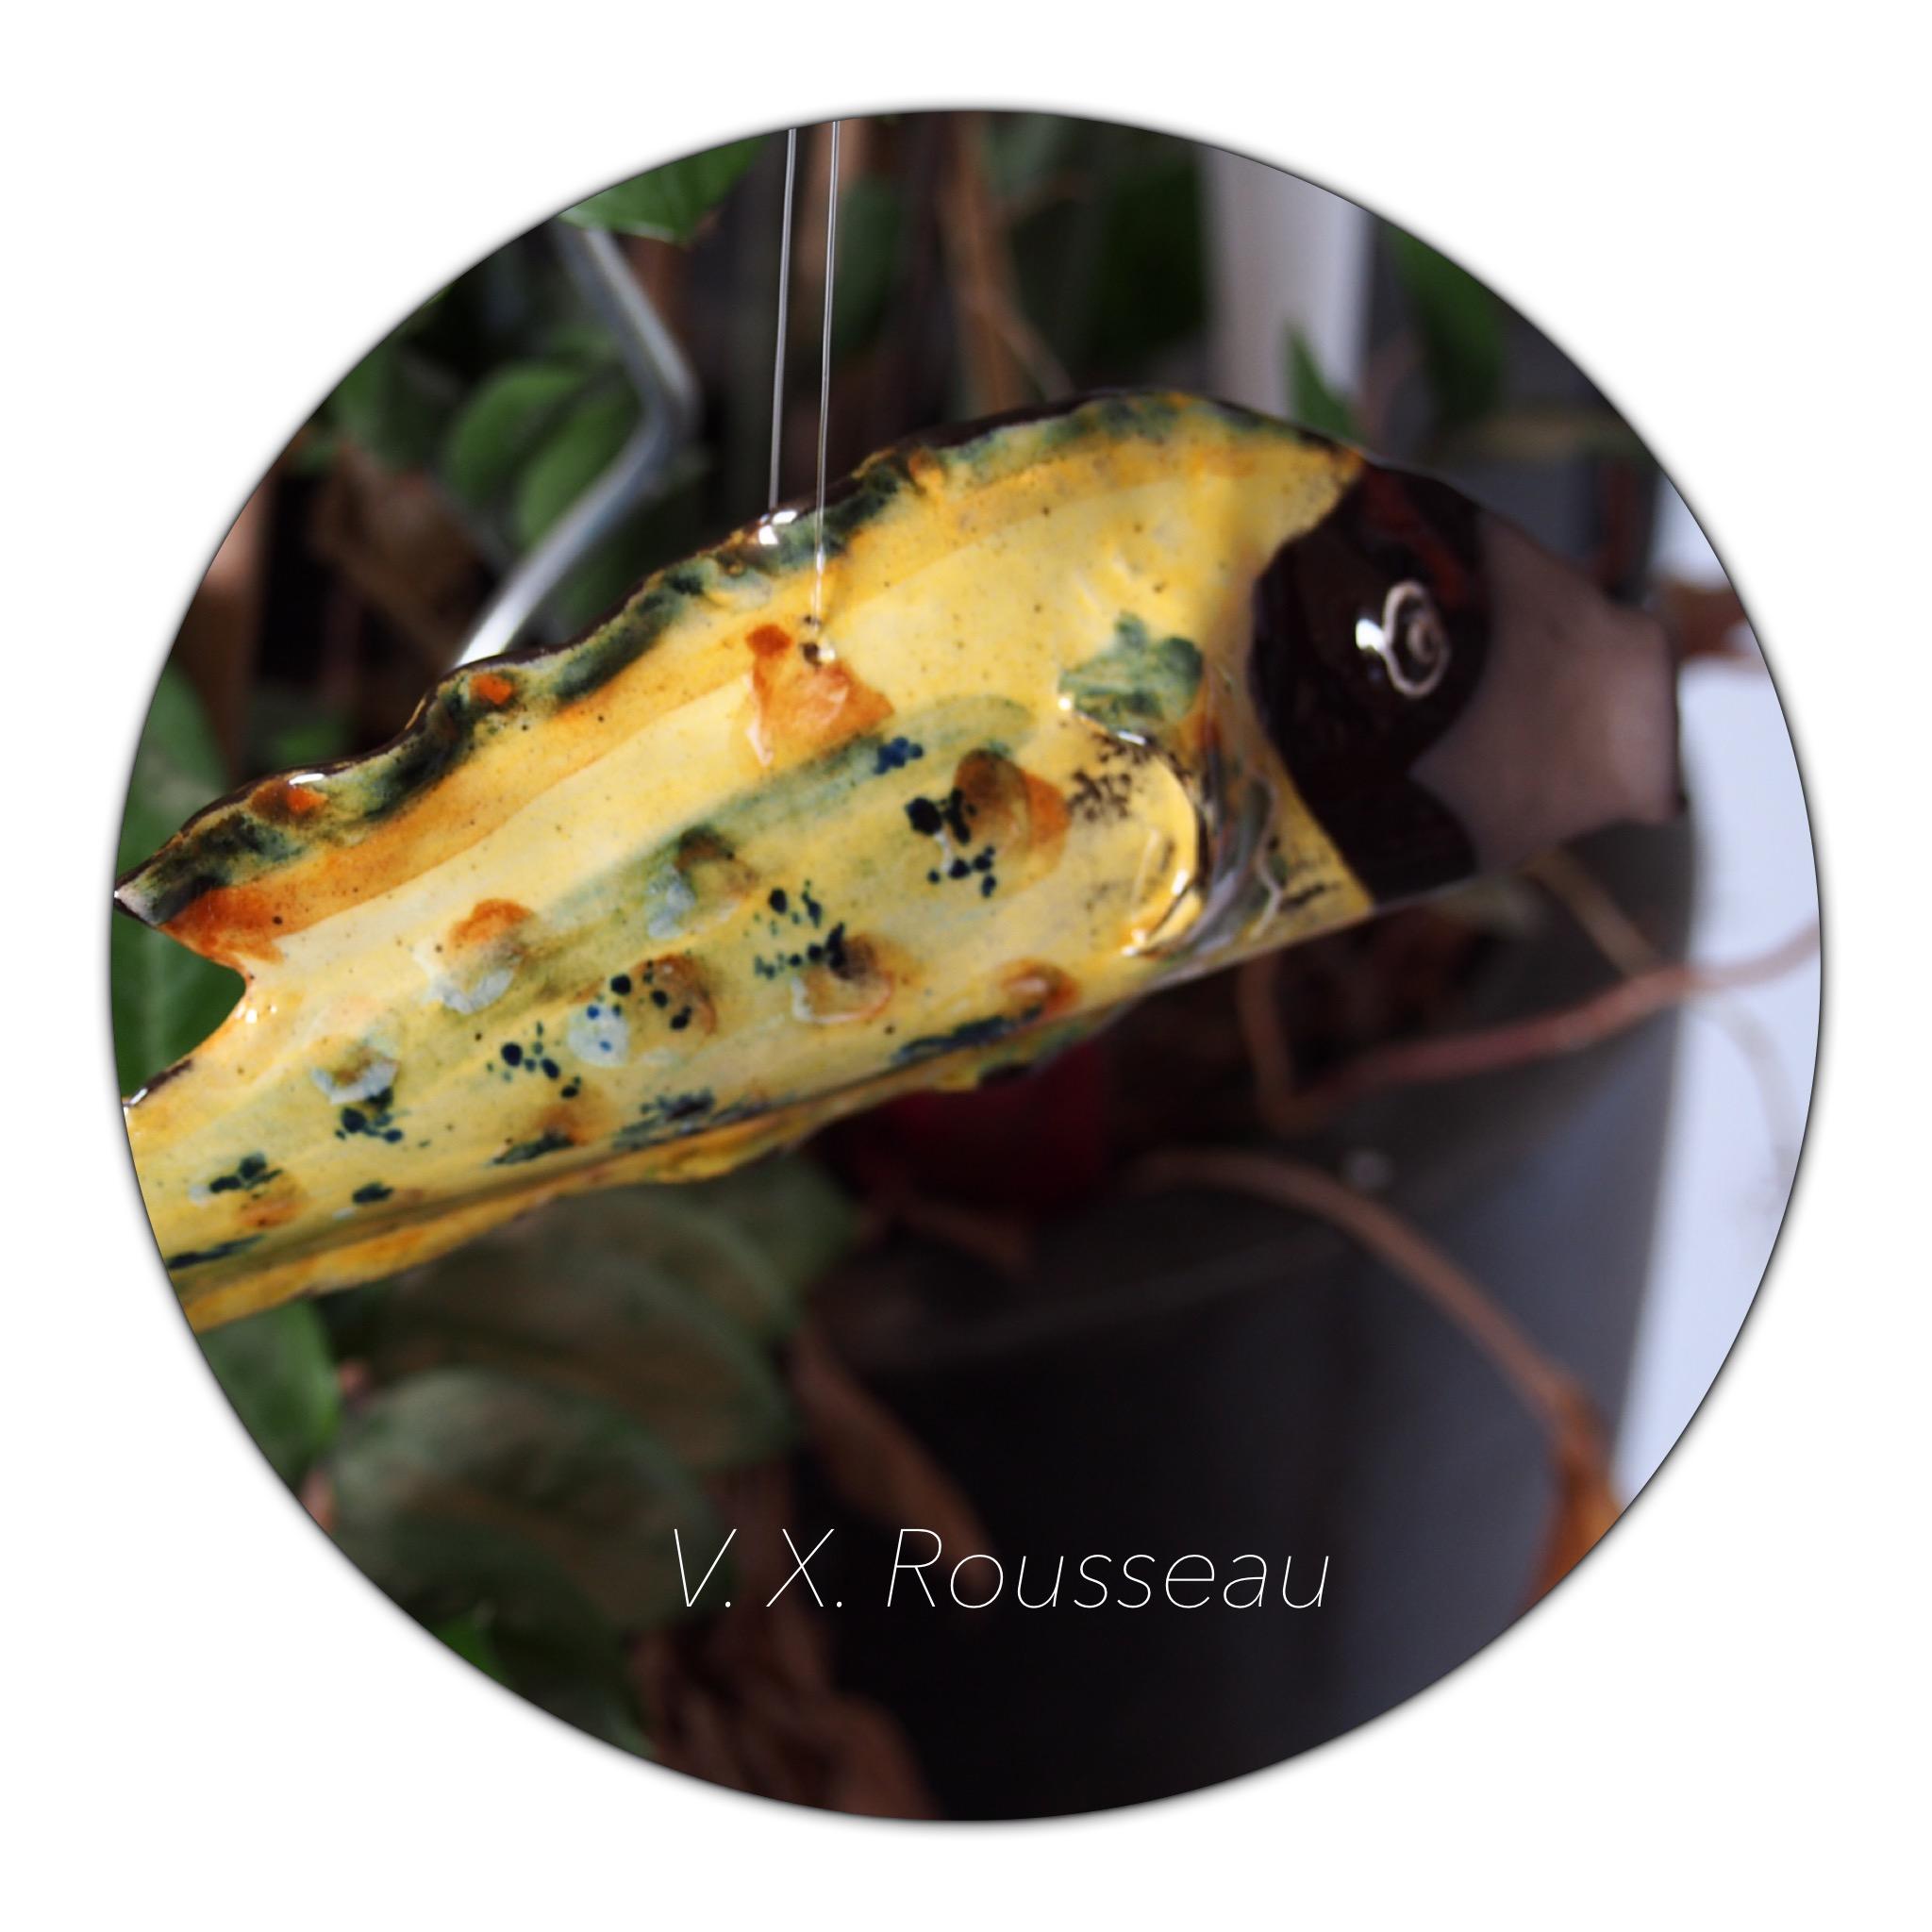 Rousseau V. X. poissons